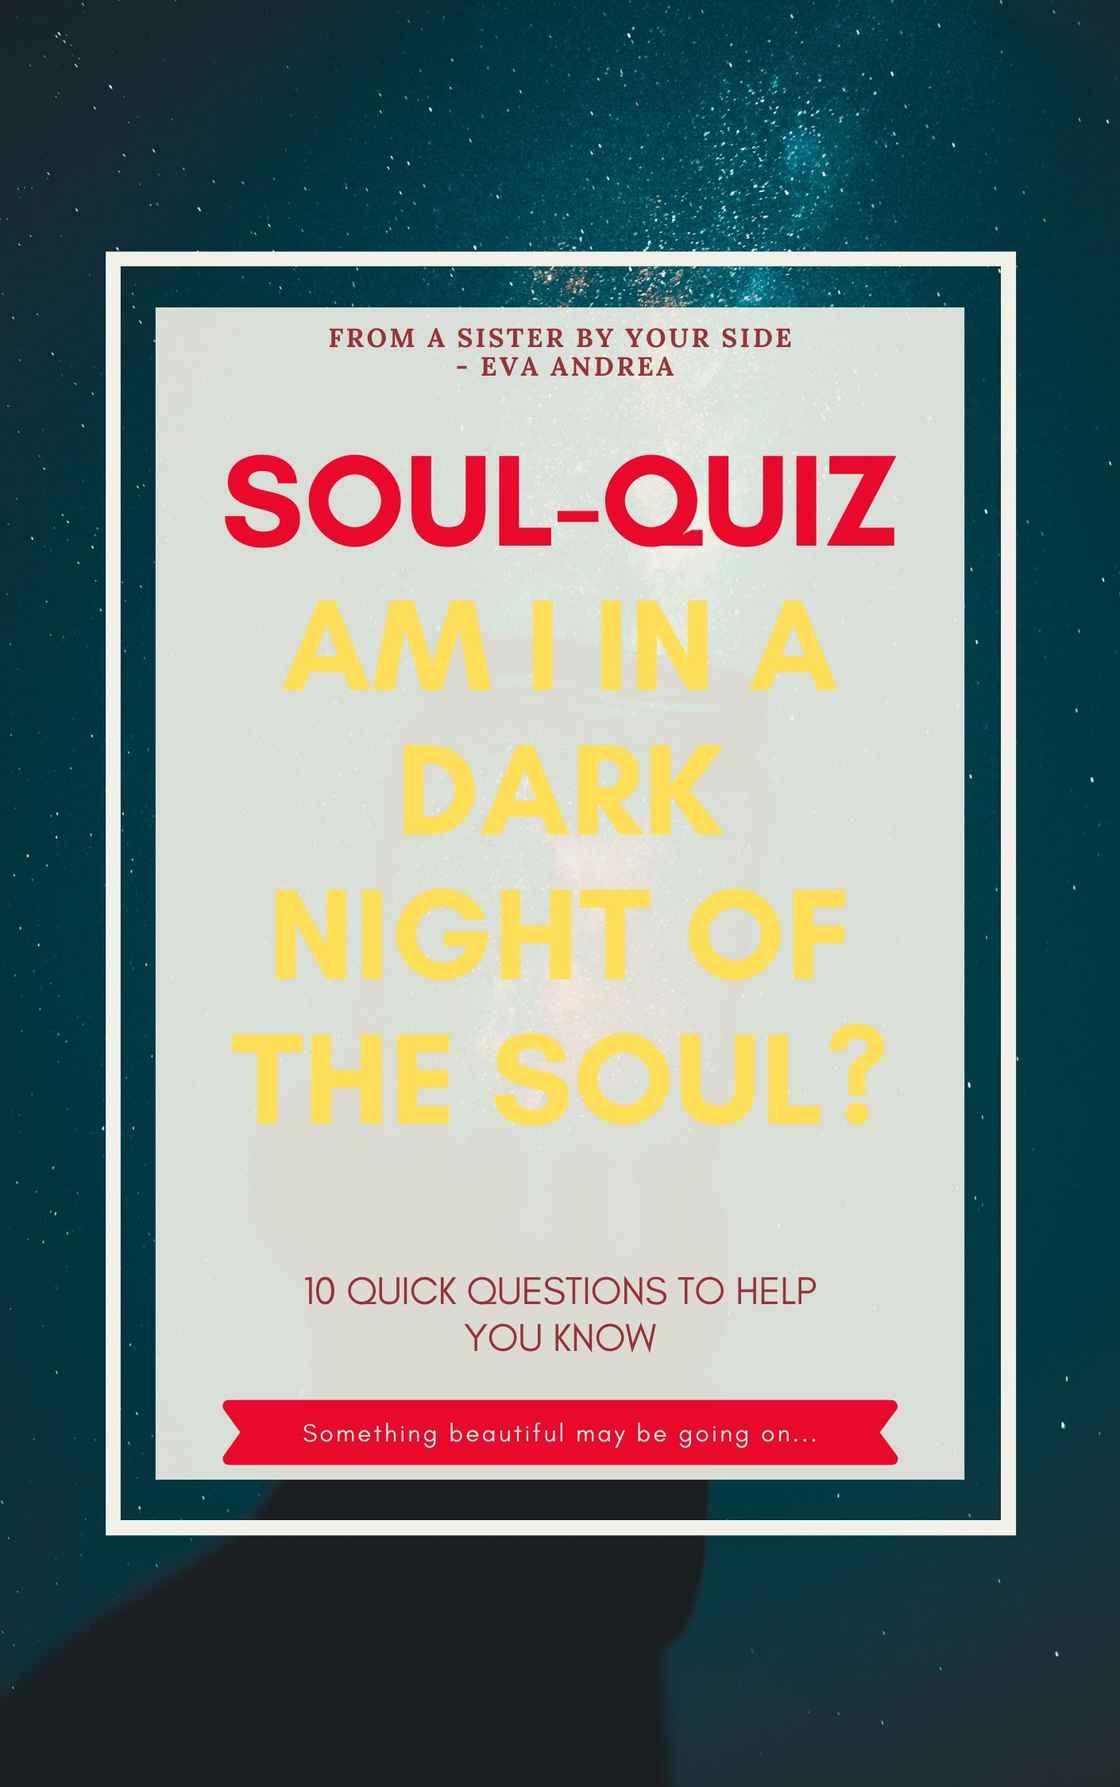 Copy of Copy of Soul-quiz.jpg